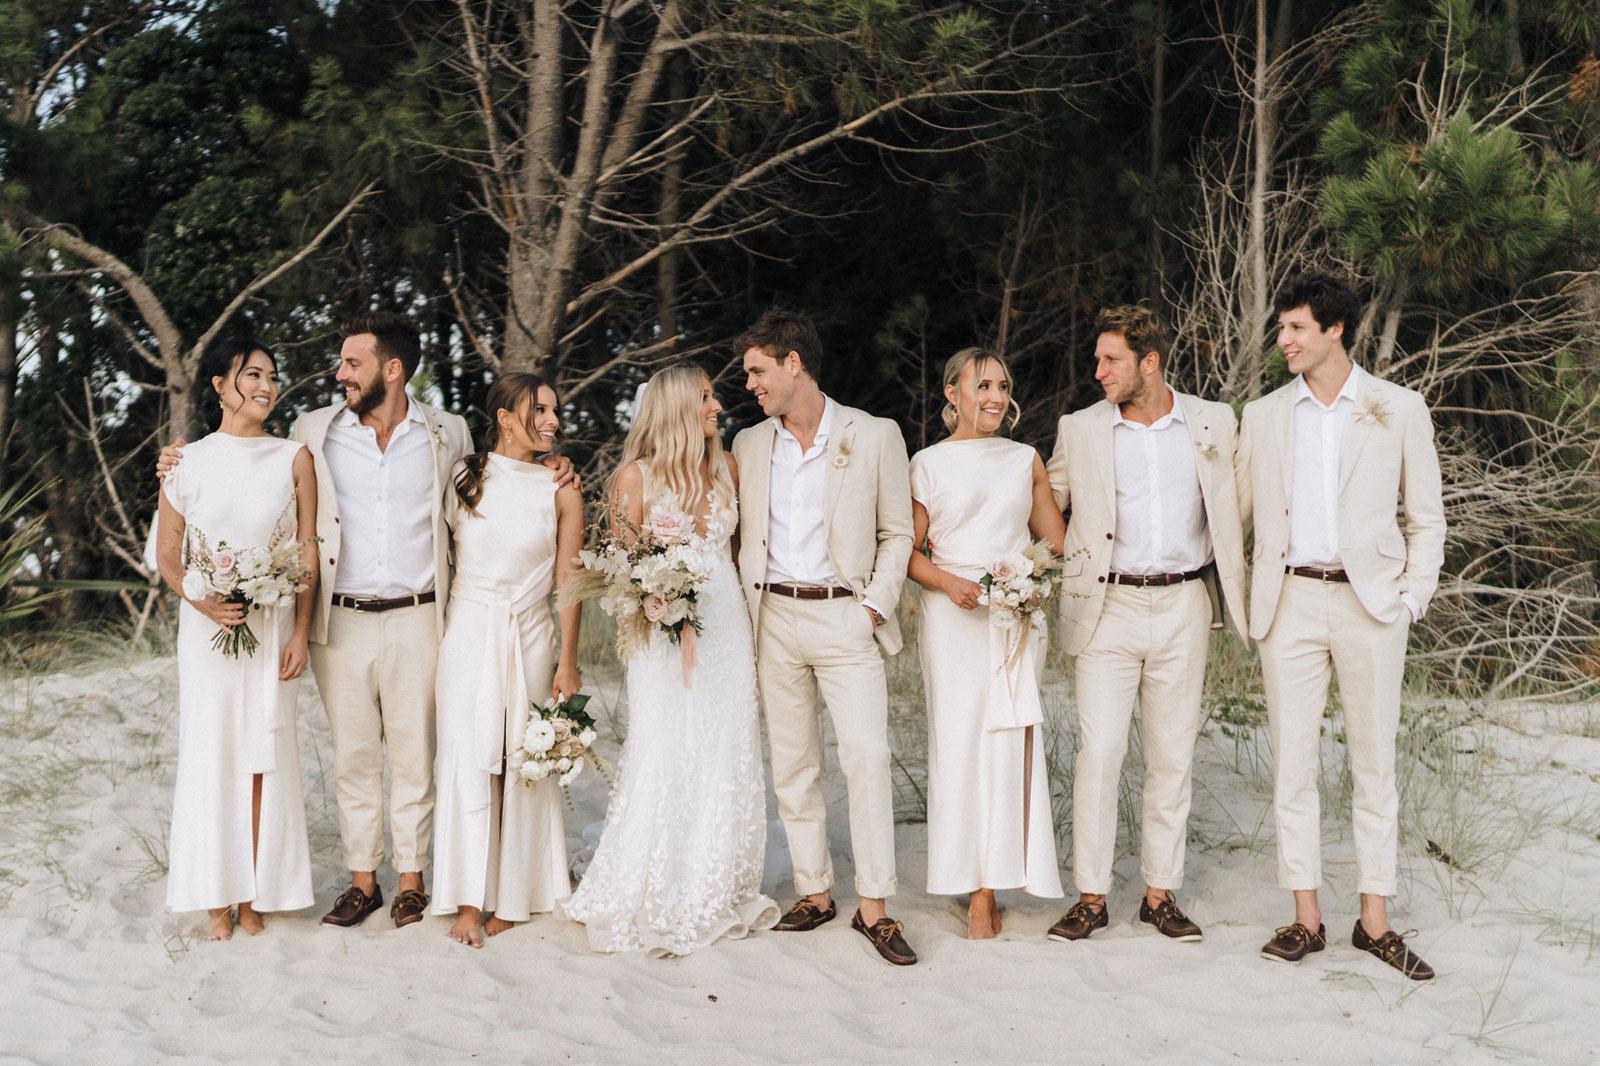 newfound-k-b-coromandel-wedding-photographers-080